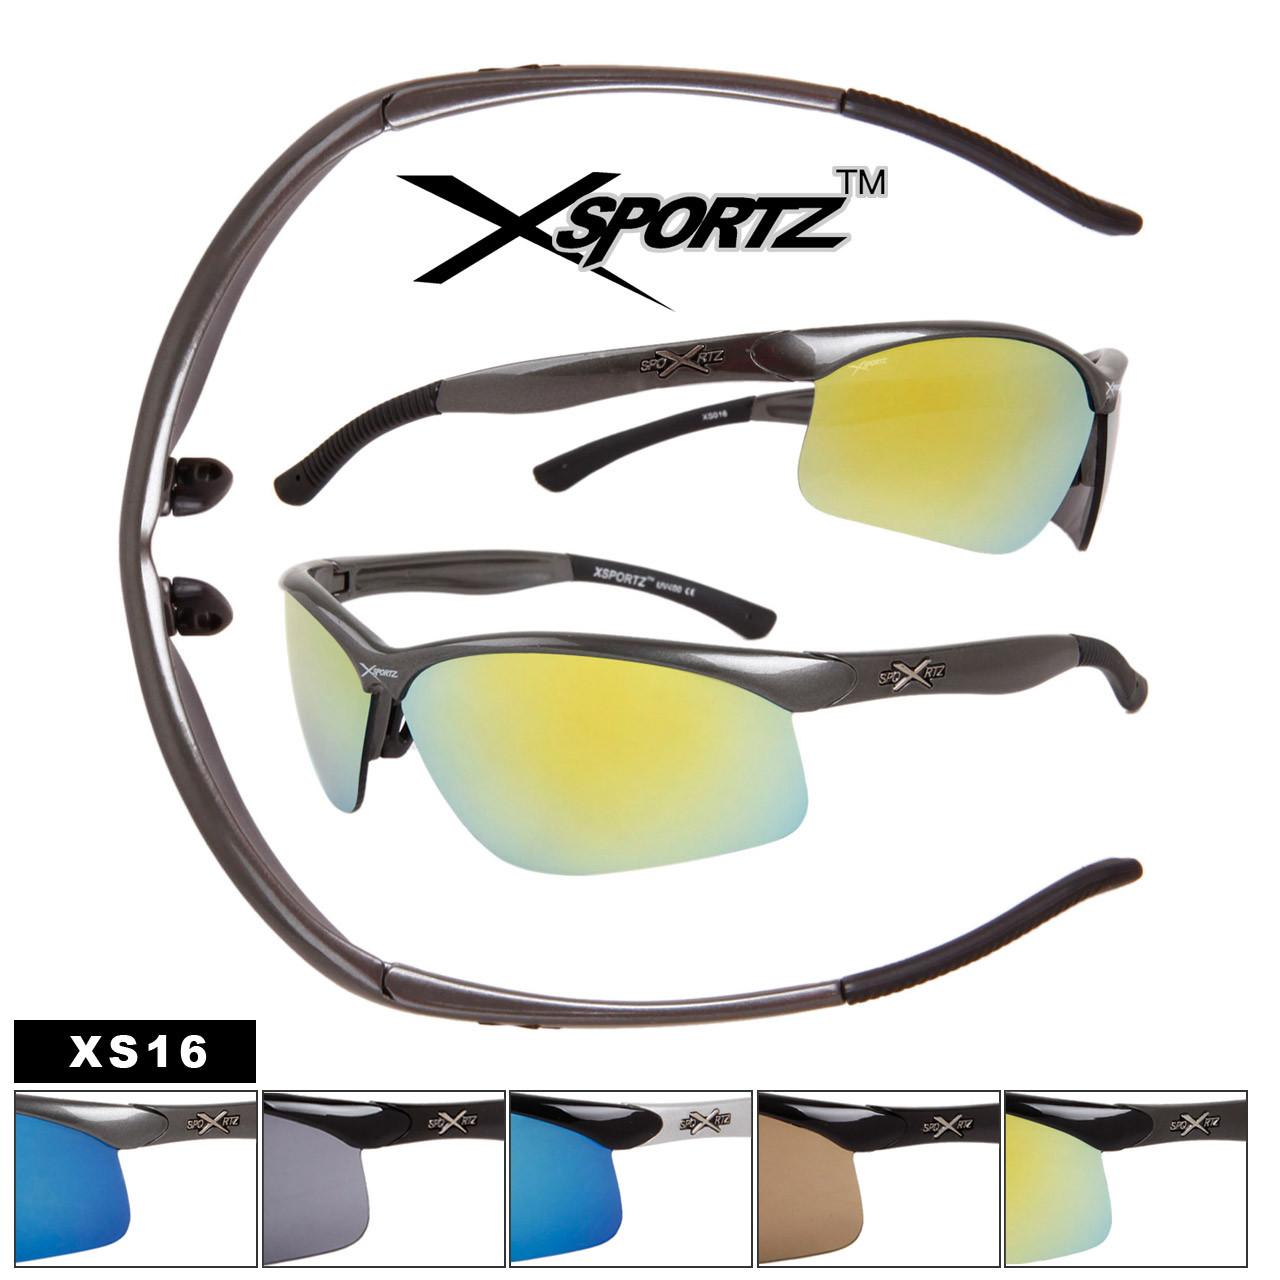 Sports Sunglasses Wholesale XS16